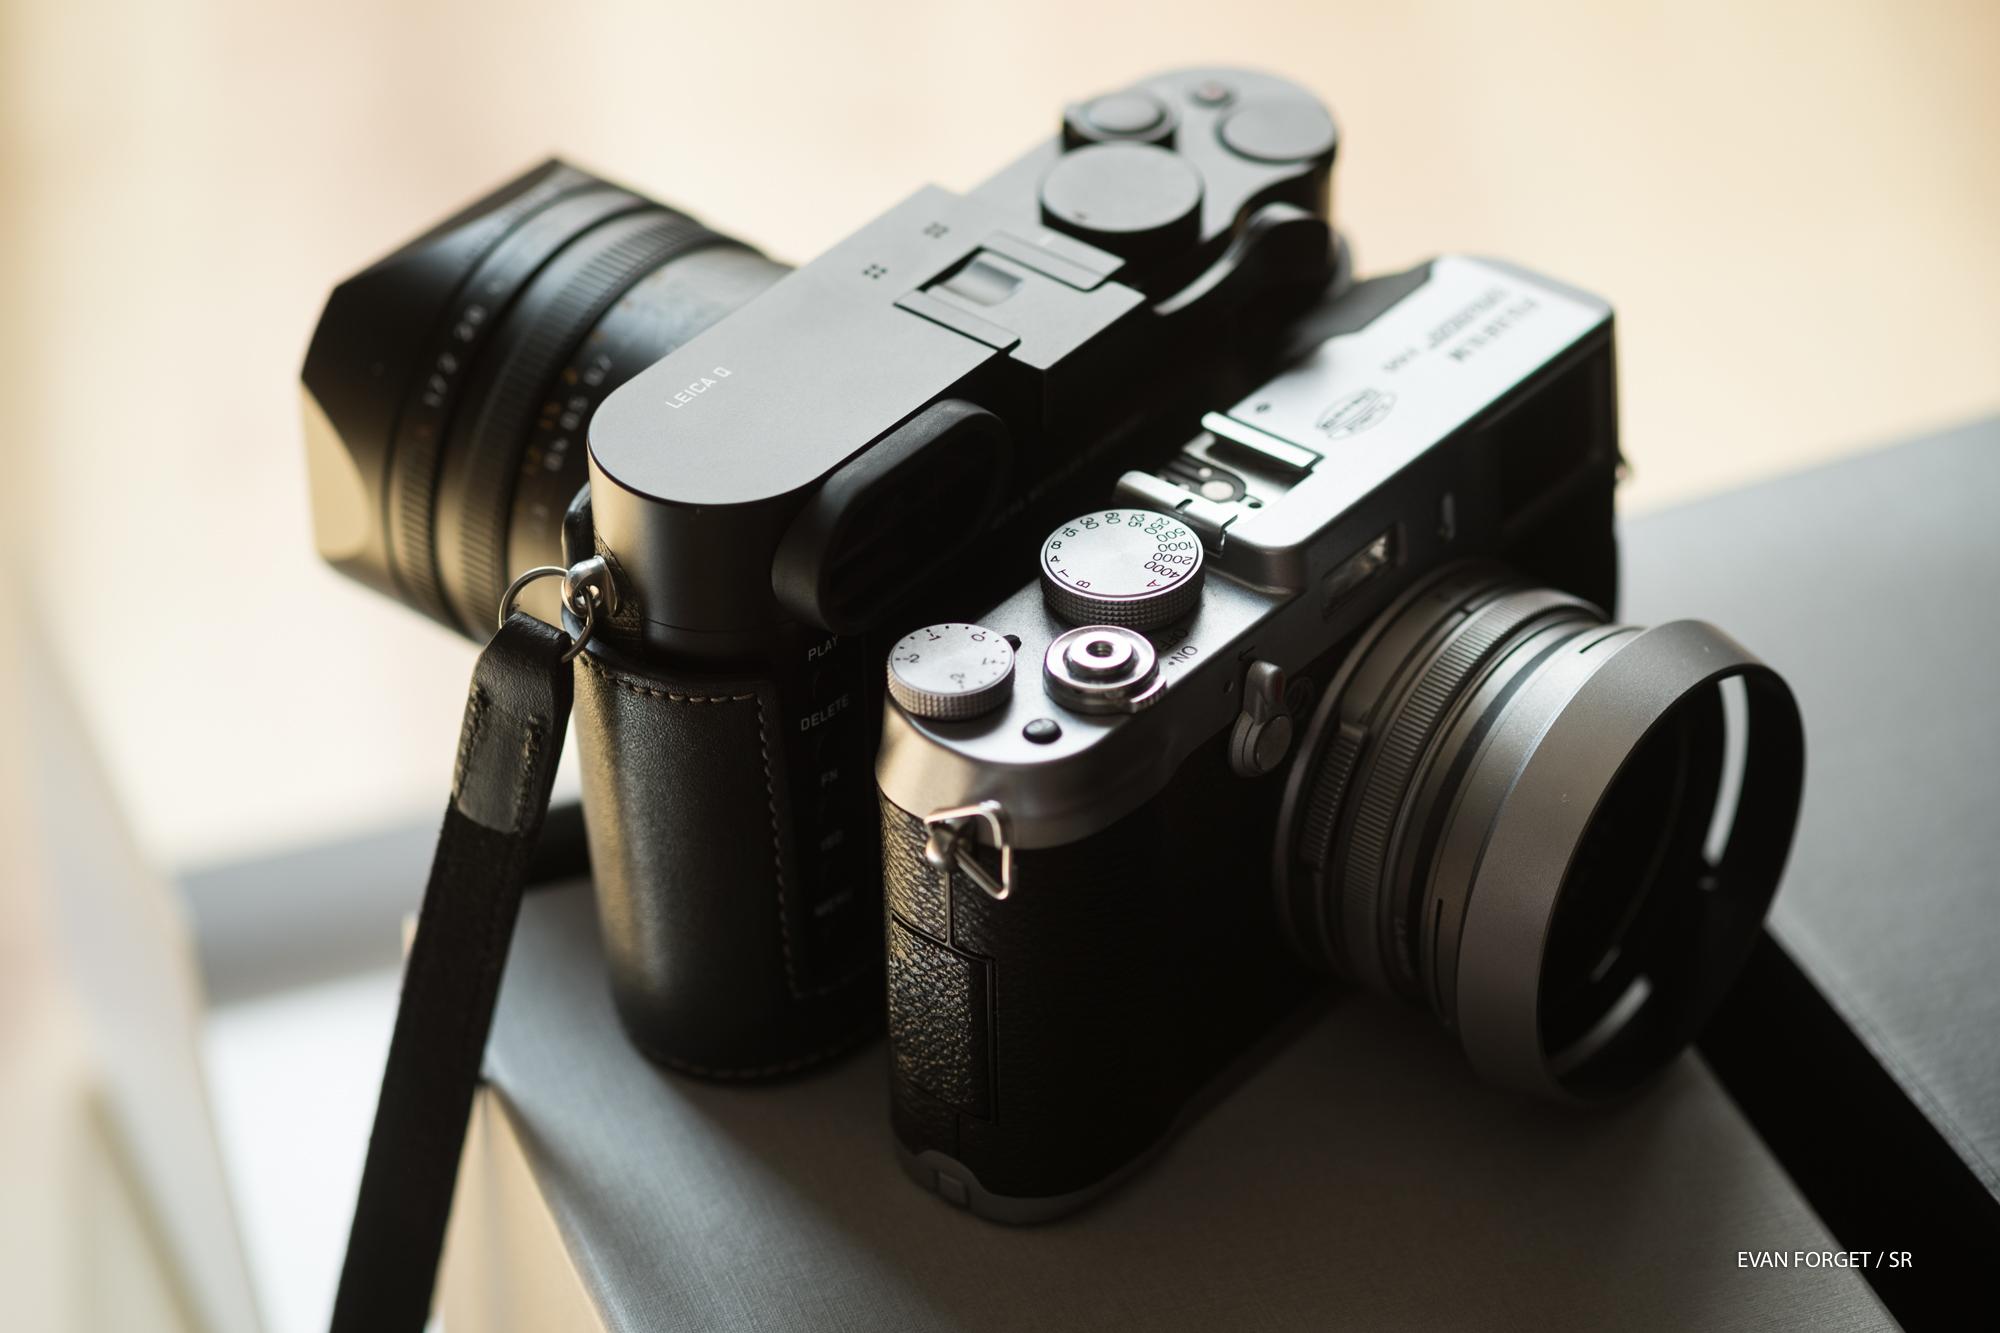 Leica Q / Fuji x100